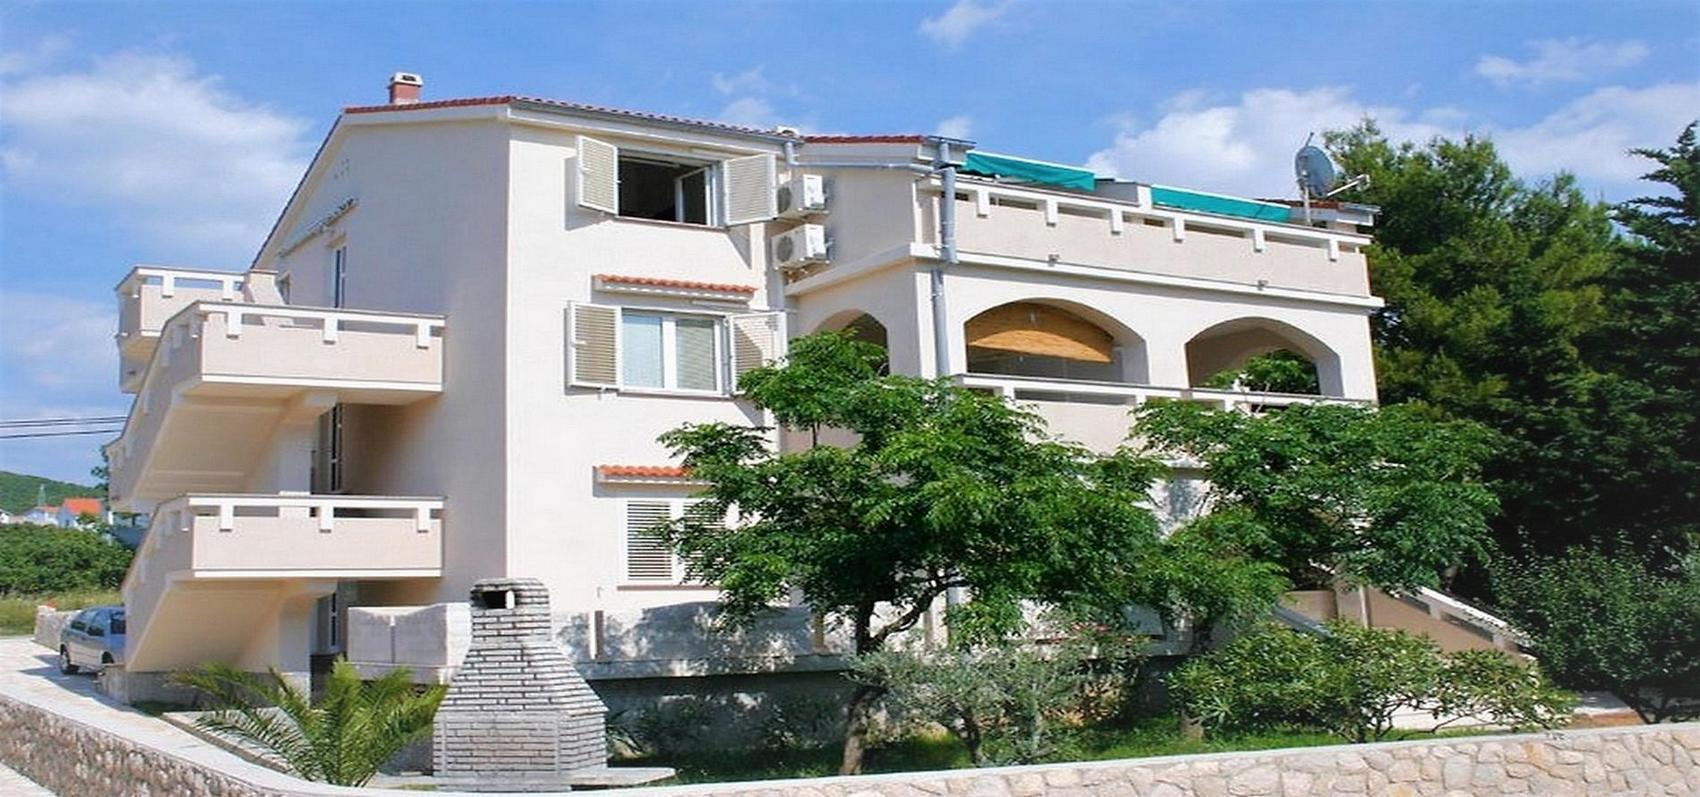 Stara Novalja - Apartments Vrtlici - Island Pag - Croatia